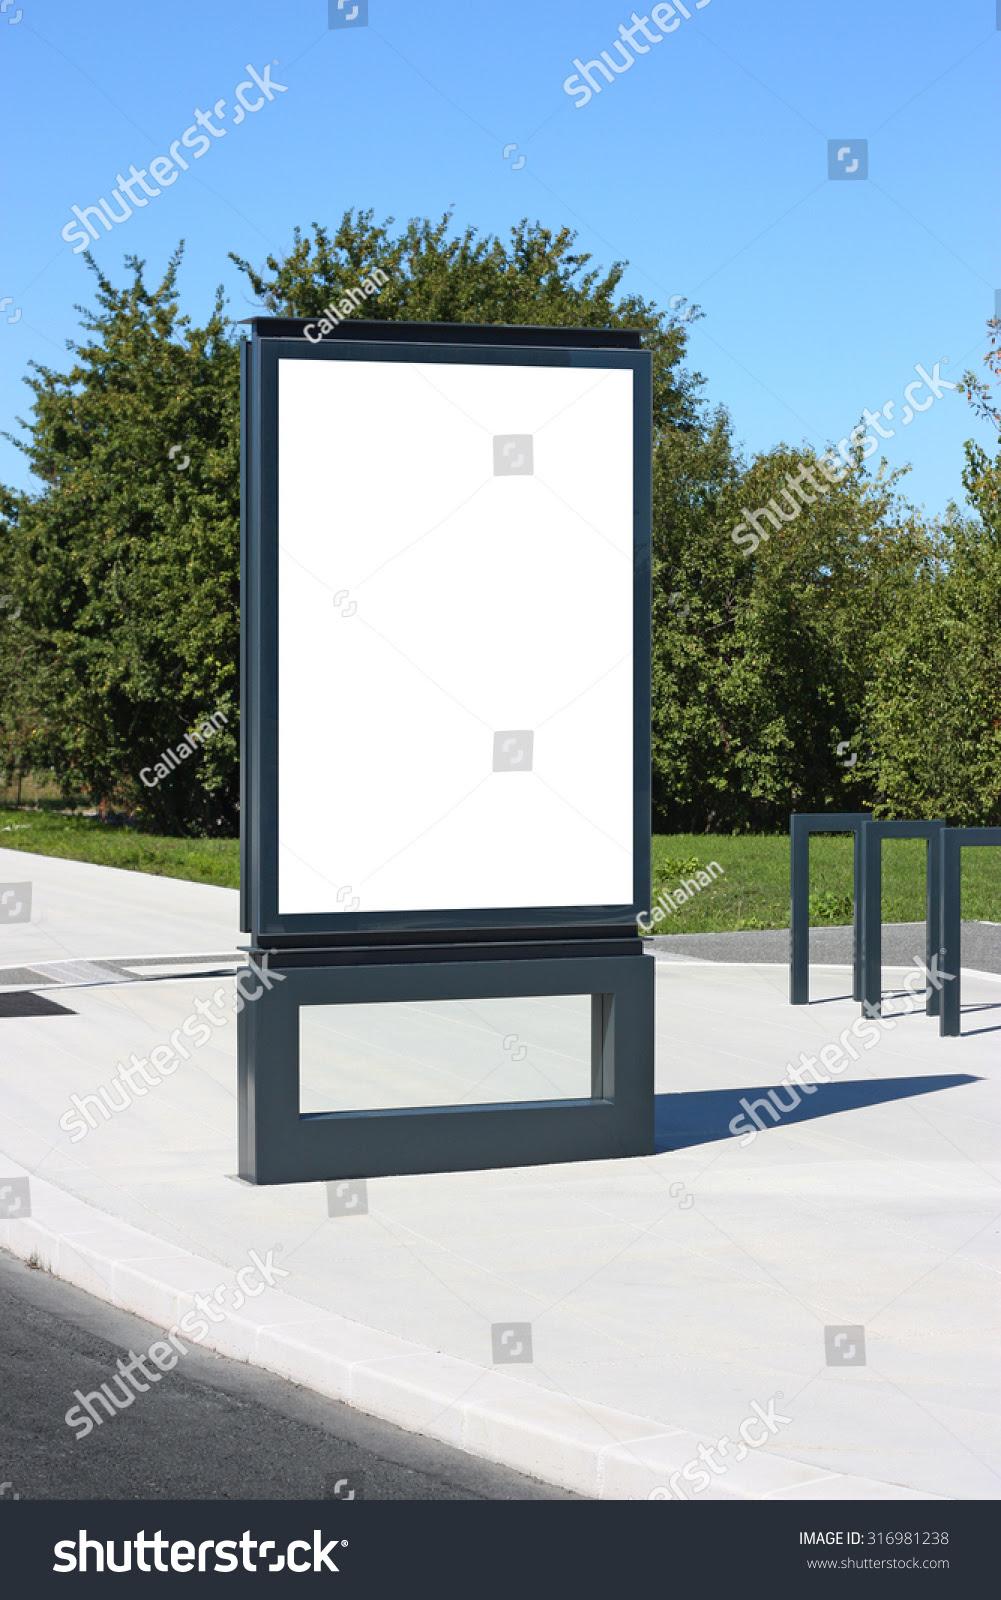 Blank Outdoor Billboard France Mockup Template Stock Photo ...